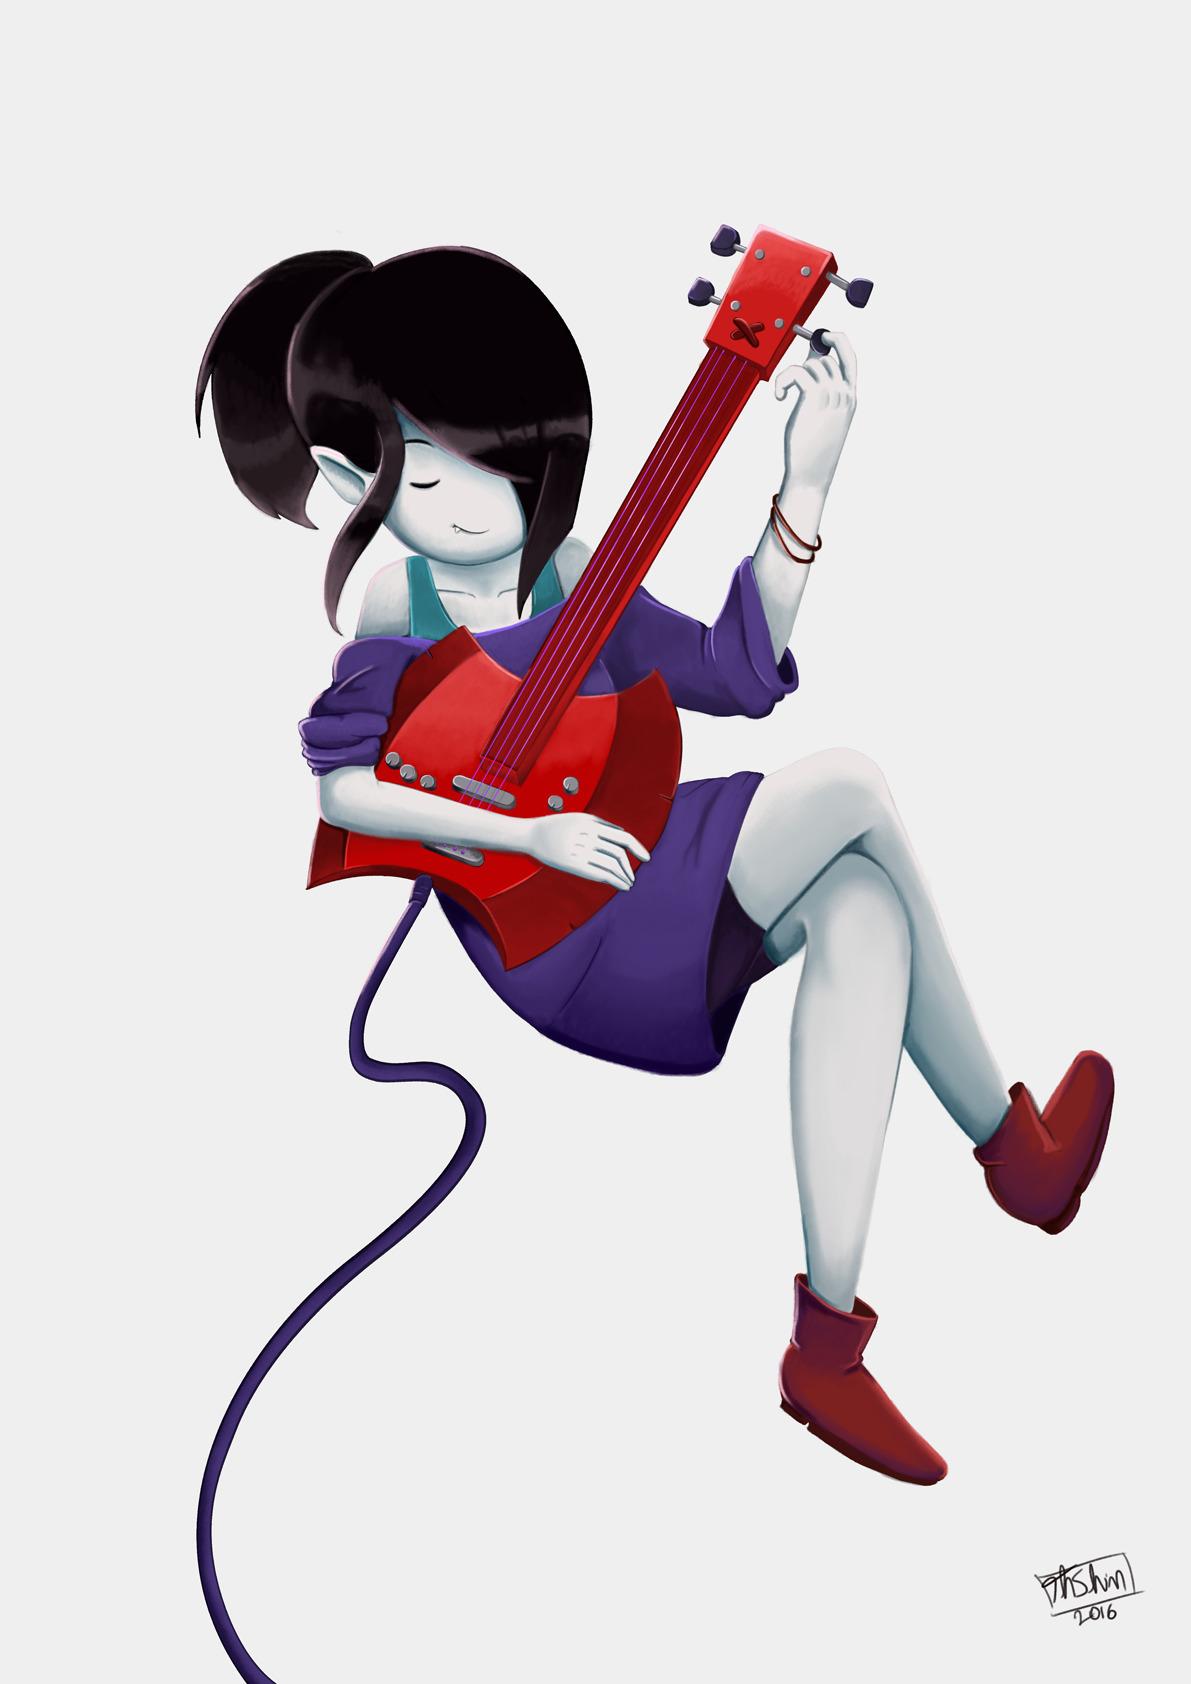 Marceline Vampire Queen fanart - thiagoshiniti | ello